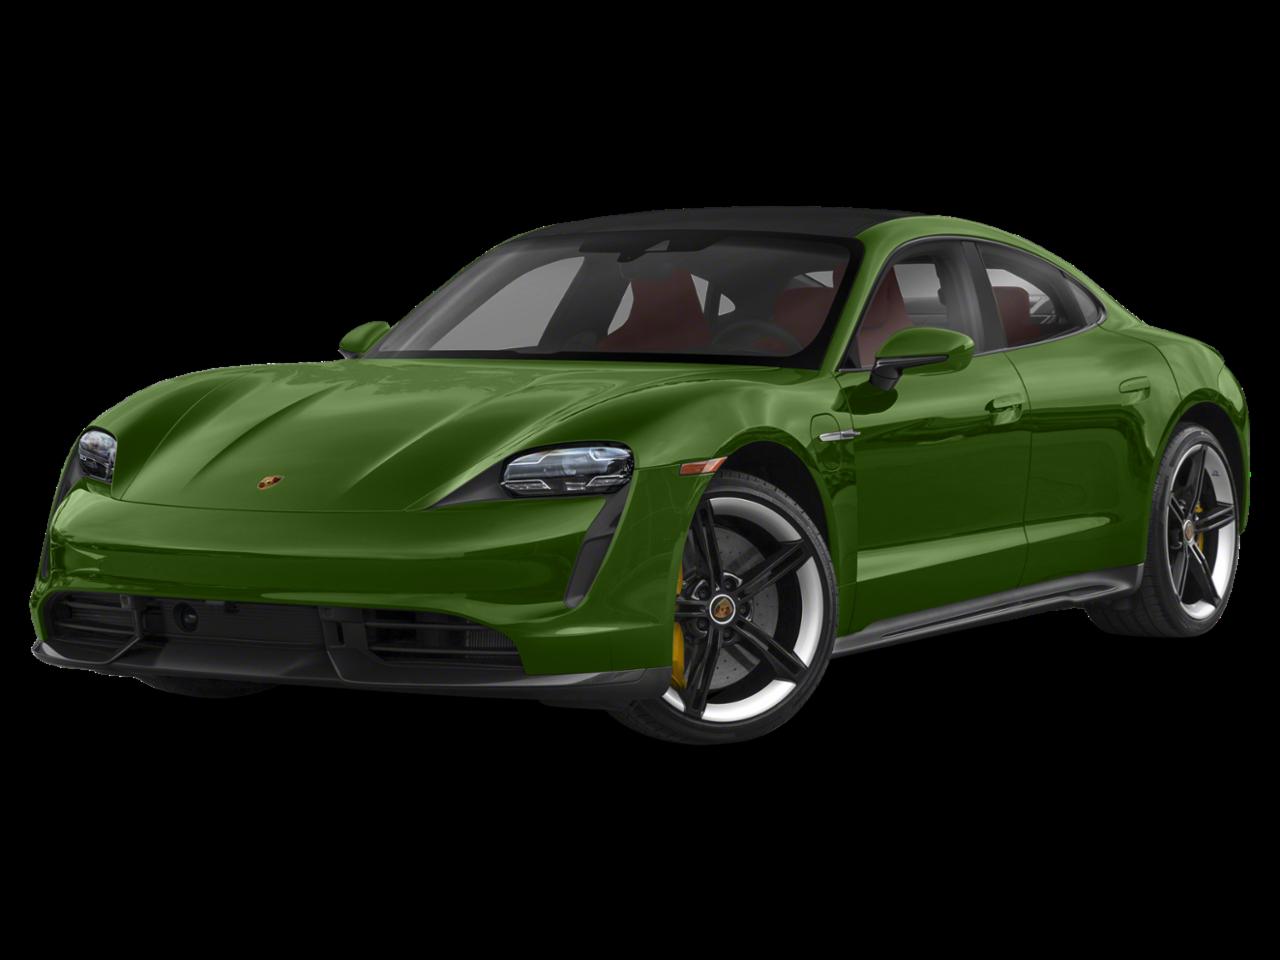 New Porsche Taycan From Your Denver Metro Area Co Dealership Stevinson Automotive